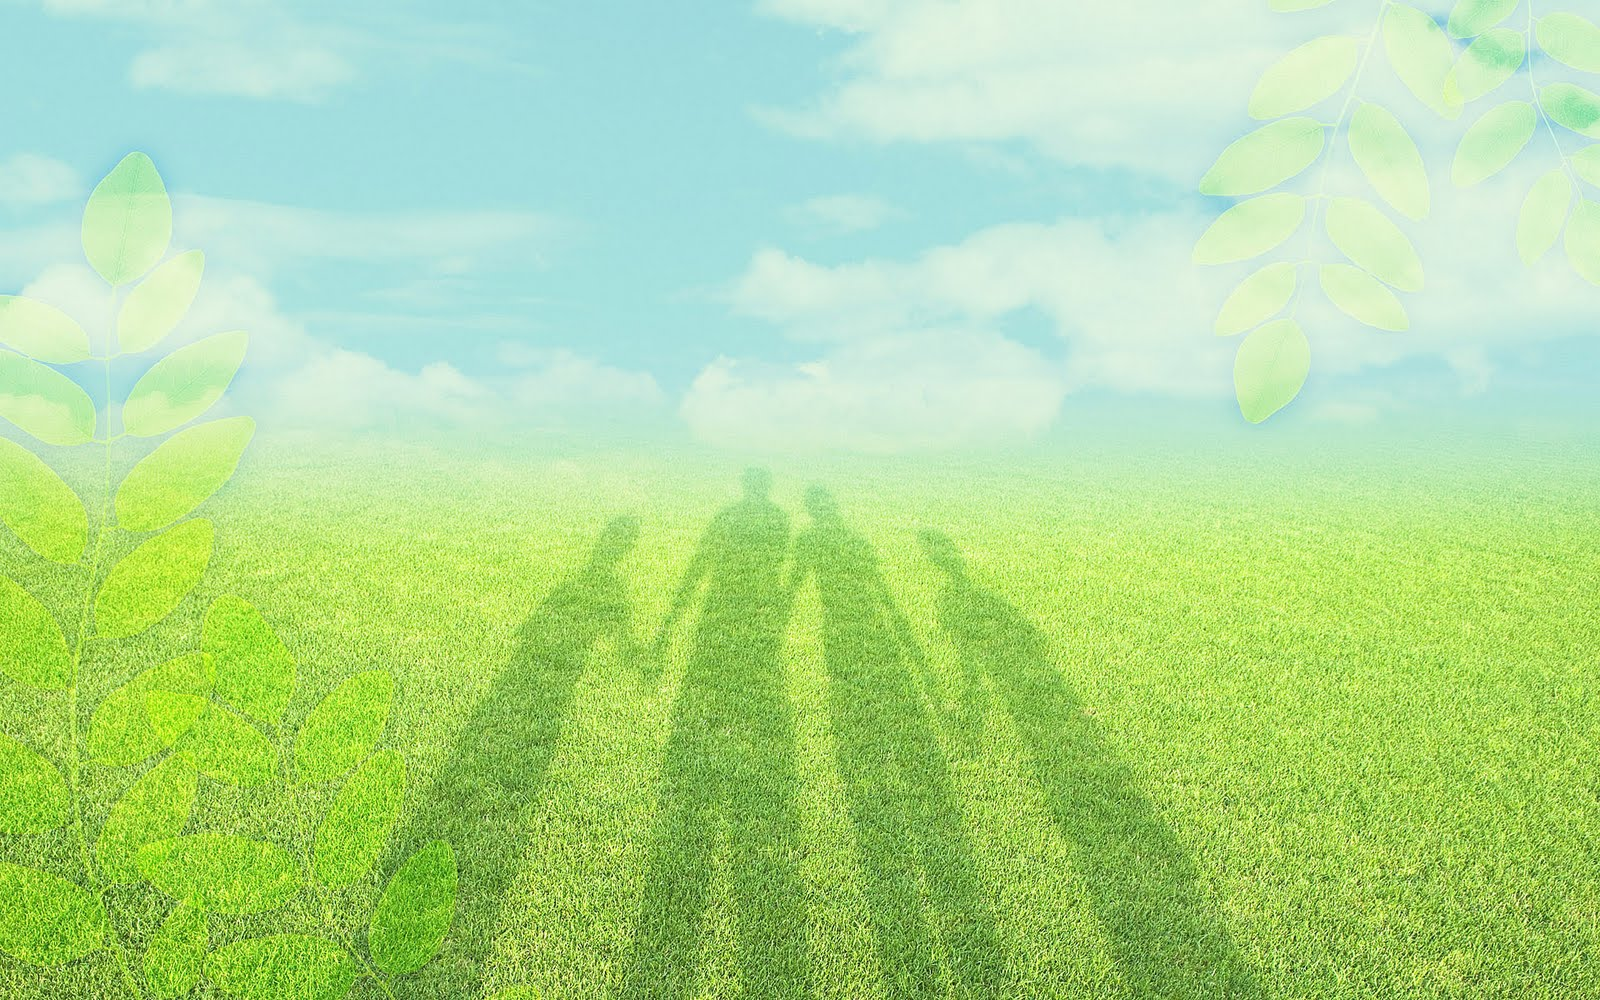 Nurturing Spirituality in the Family